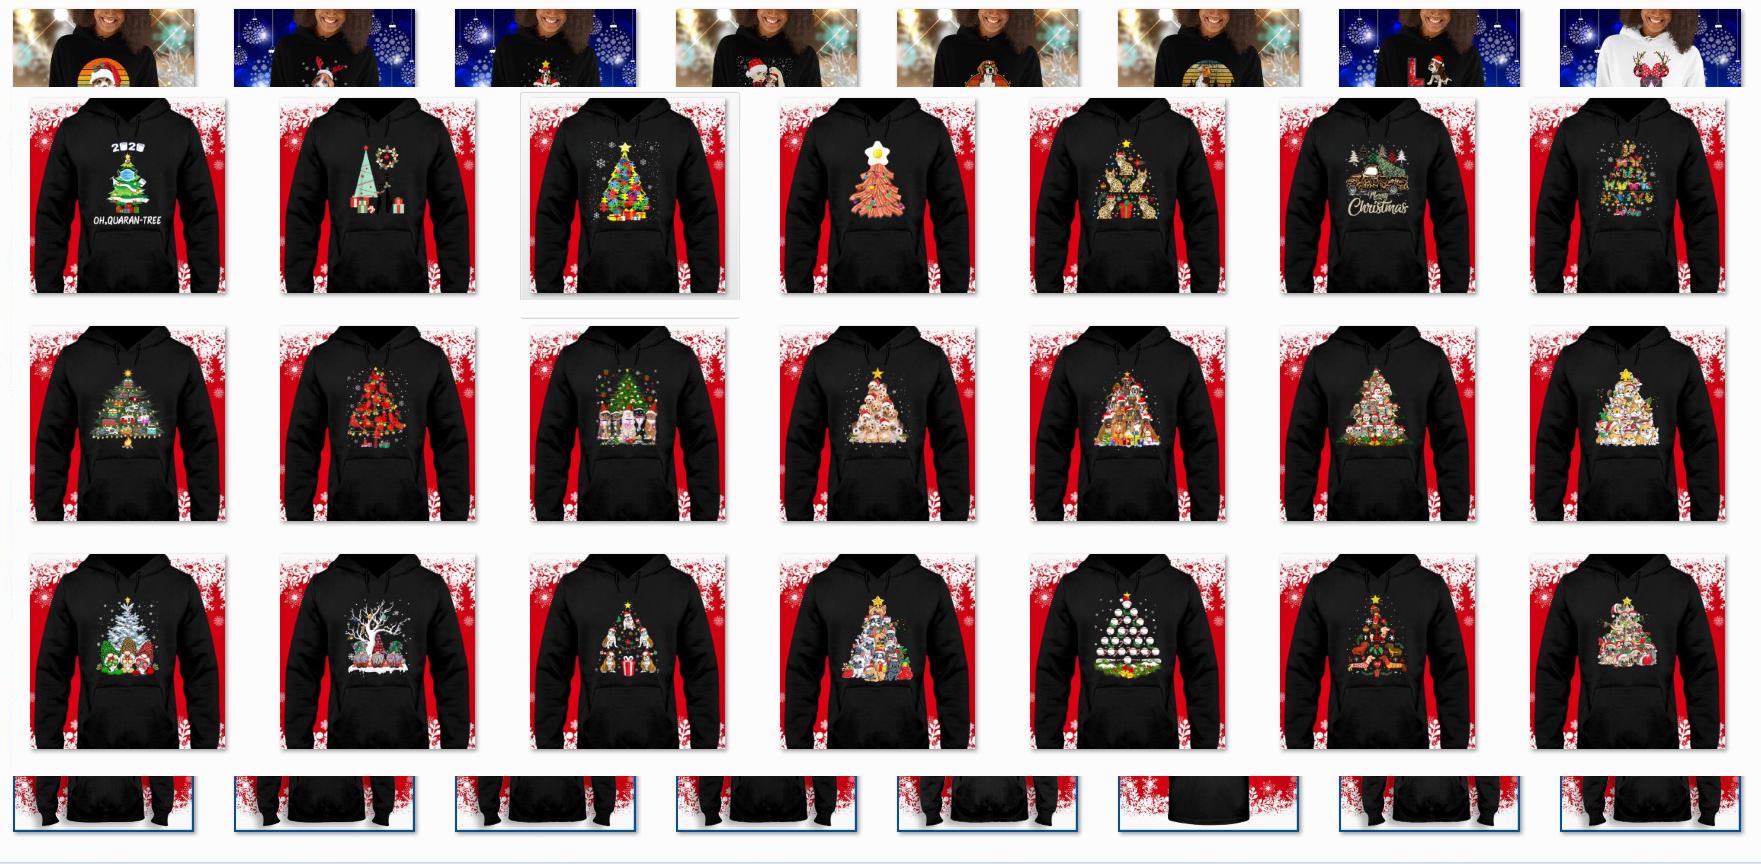 500 PNG files Christmas T shirt Design Ready To Printable